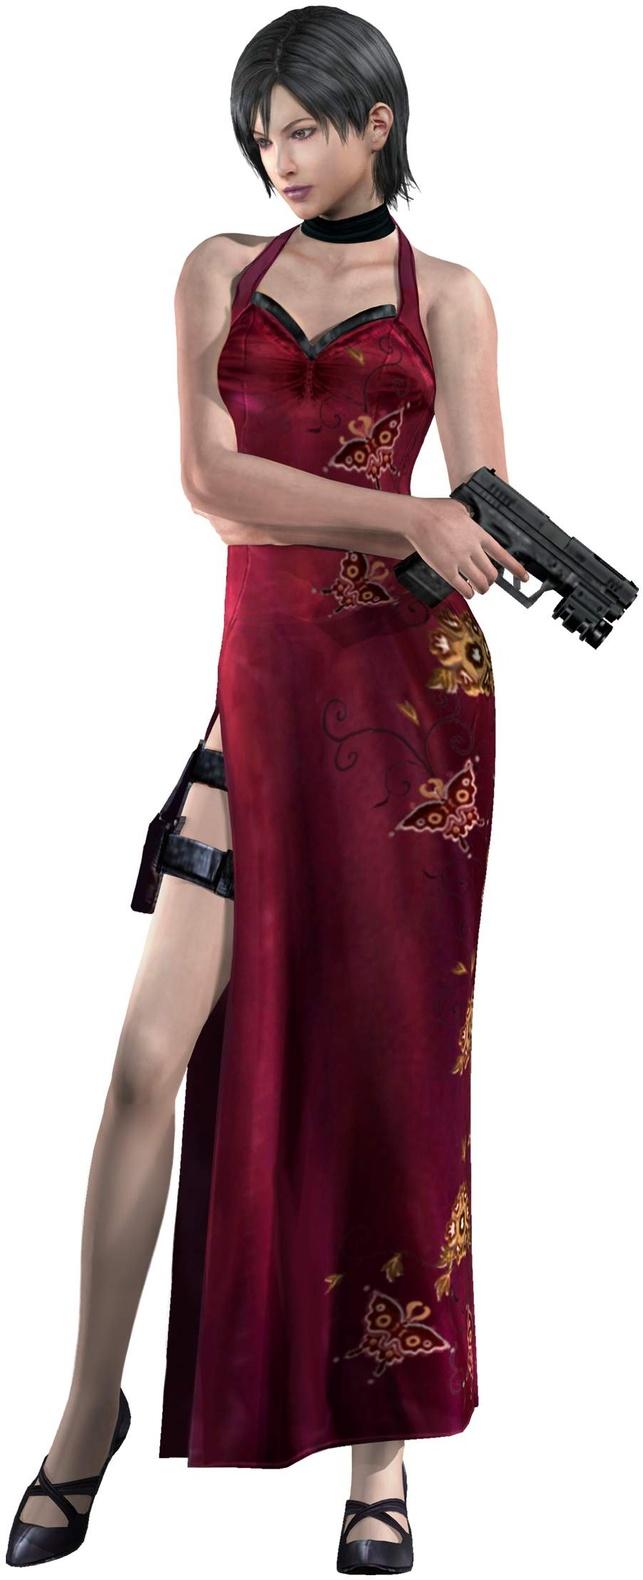 [COMBATE #10] Peach  vs Lara Croft vs Mai Shiranui vs Lucy vs Cortana vs Ada Wong vs Chiristie Monteiro vs Faith Connors AdaWong